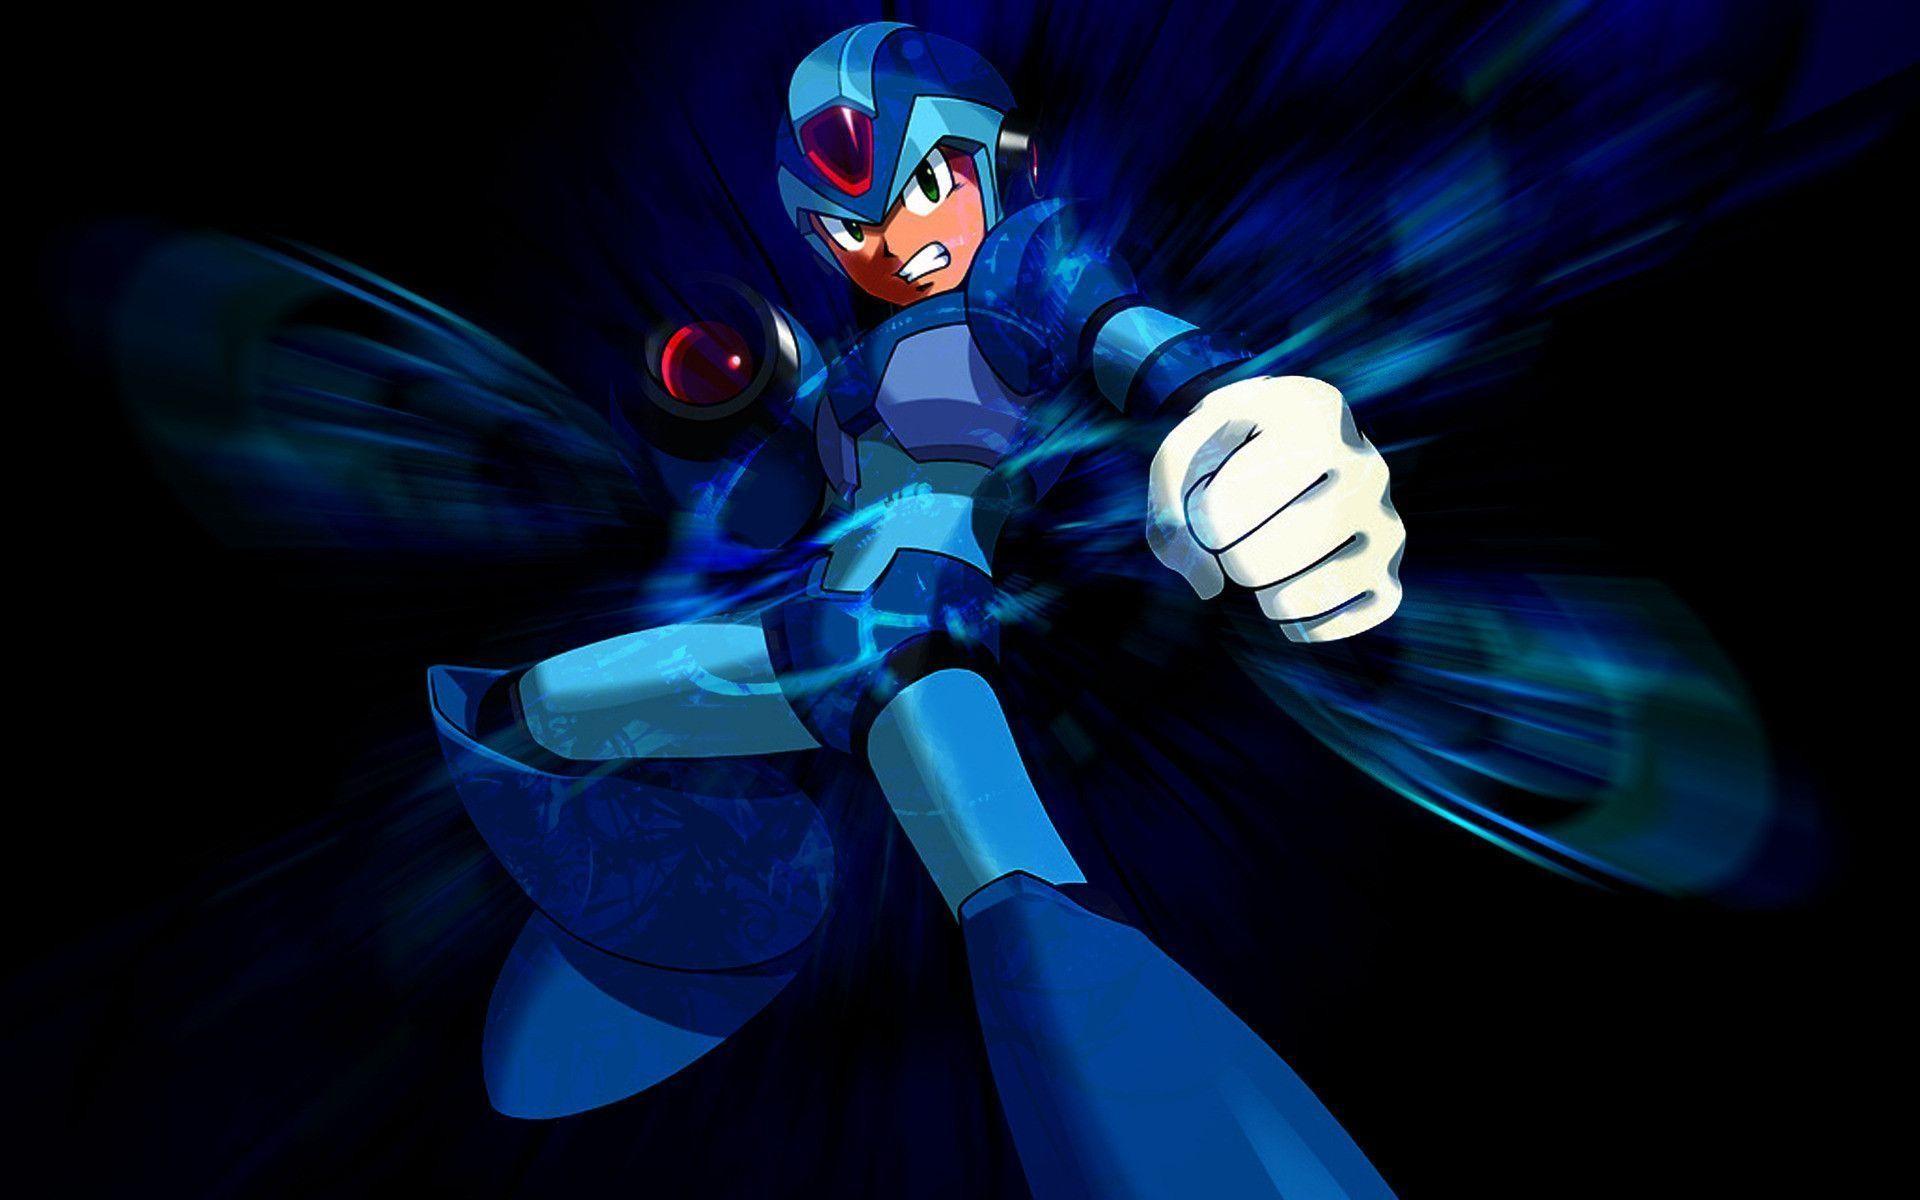 Mega Man Wallpapers – Full HD wallpaper search